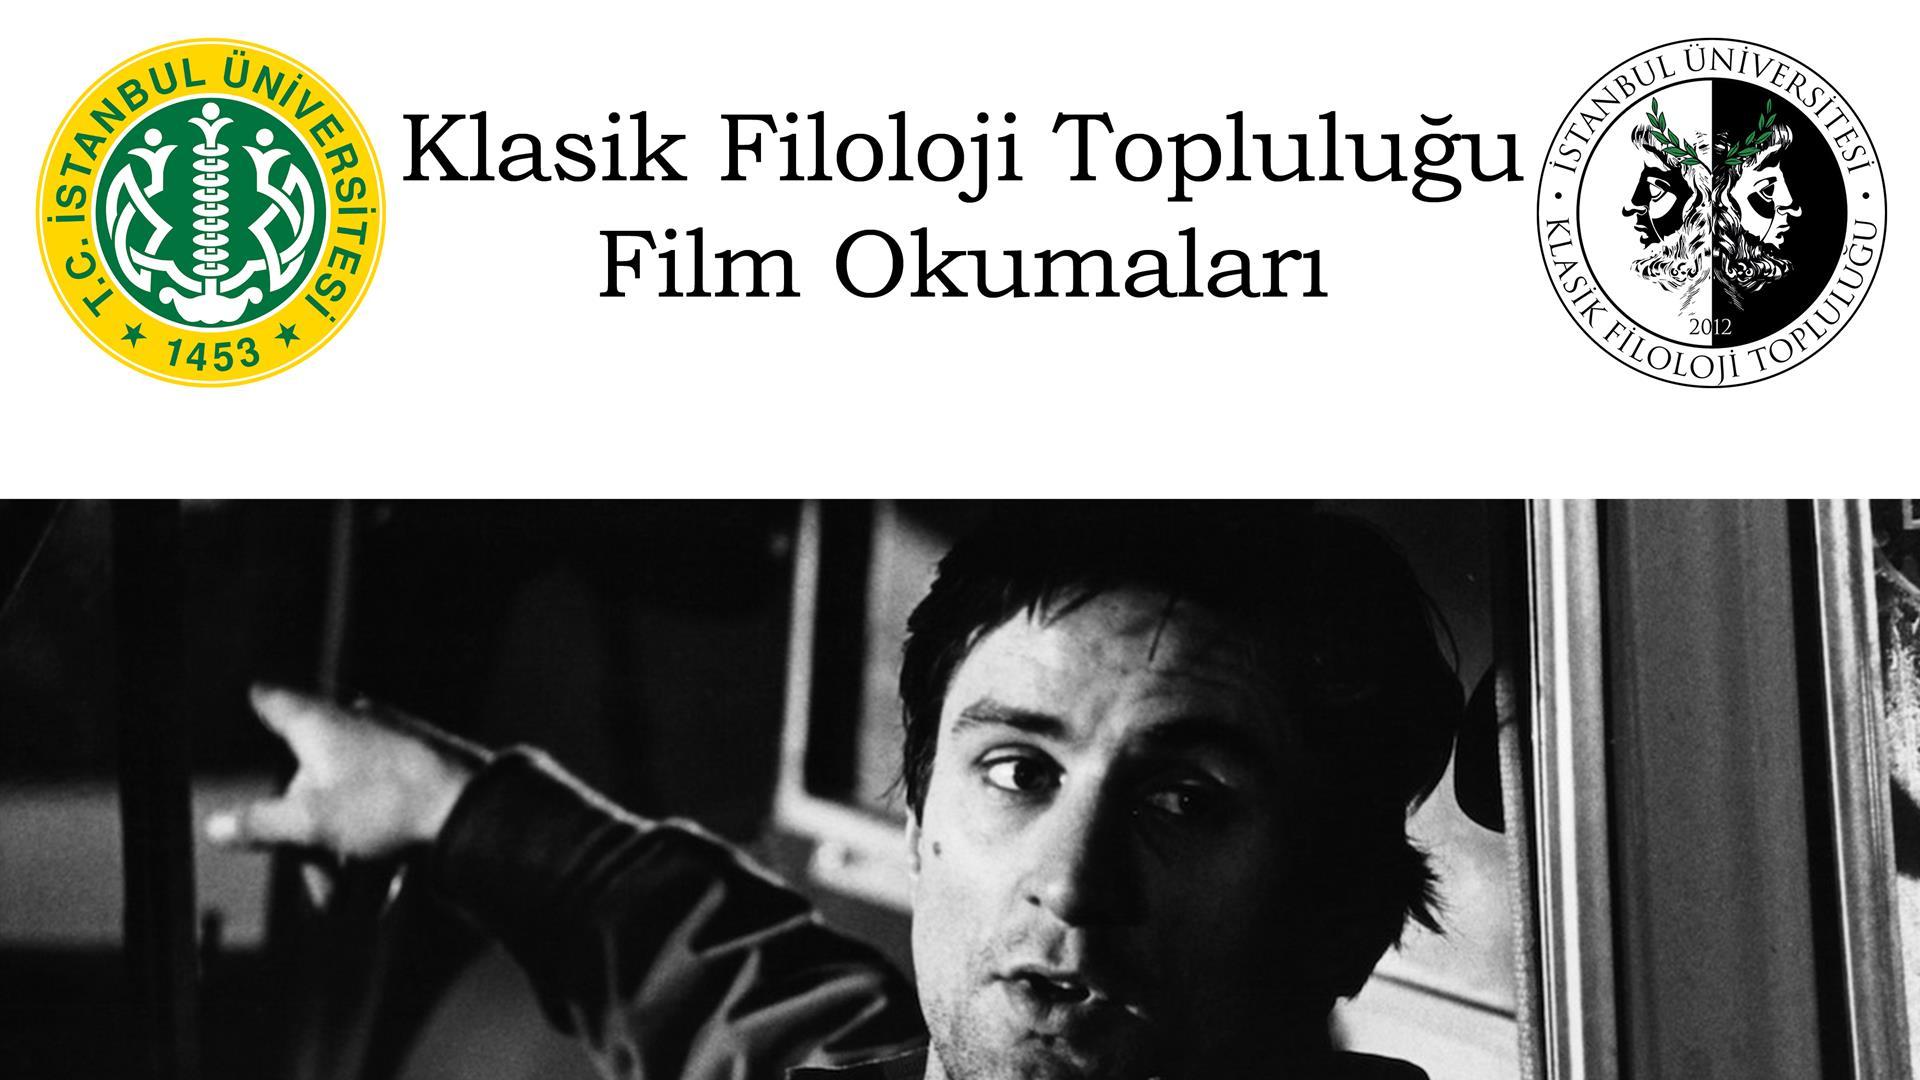 Martin-Scorsese Taxi-Driver Ali-Şimşek